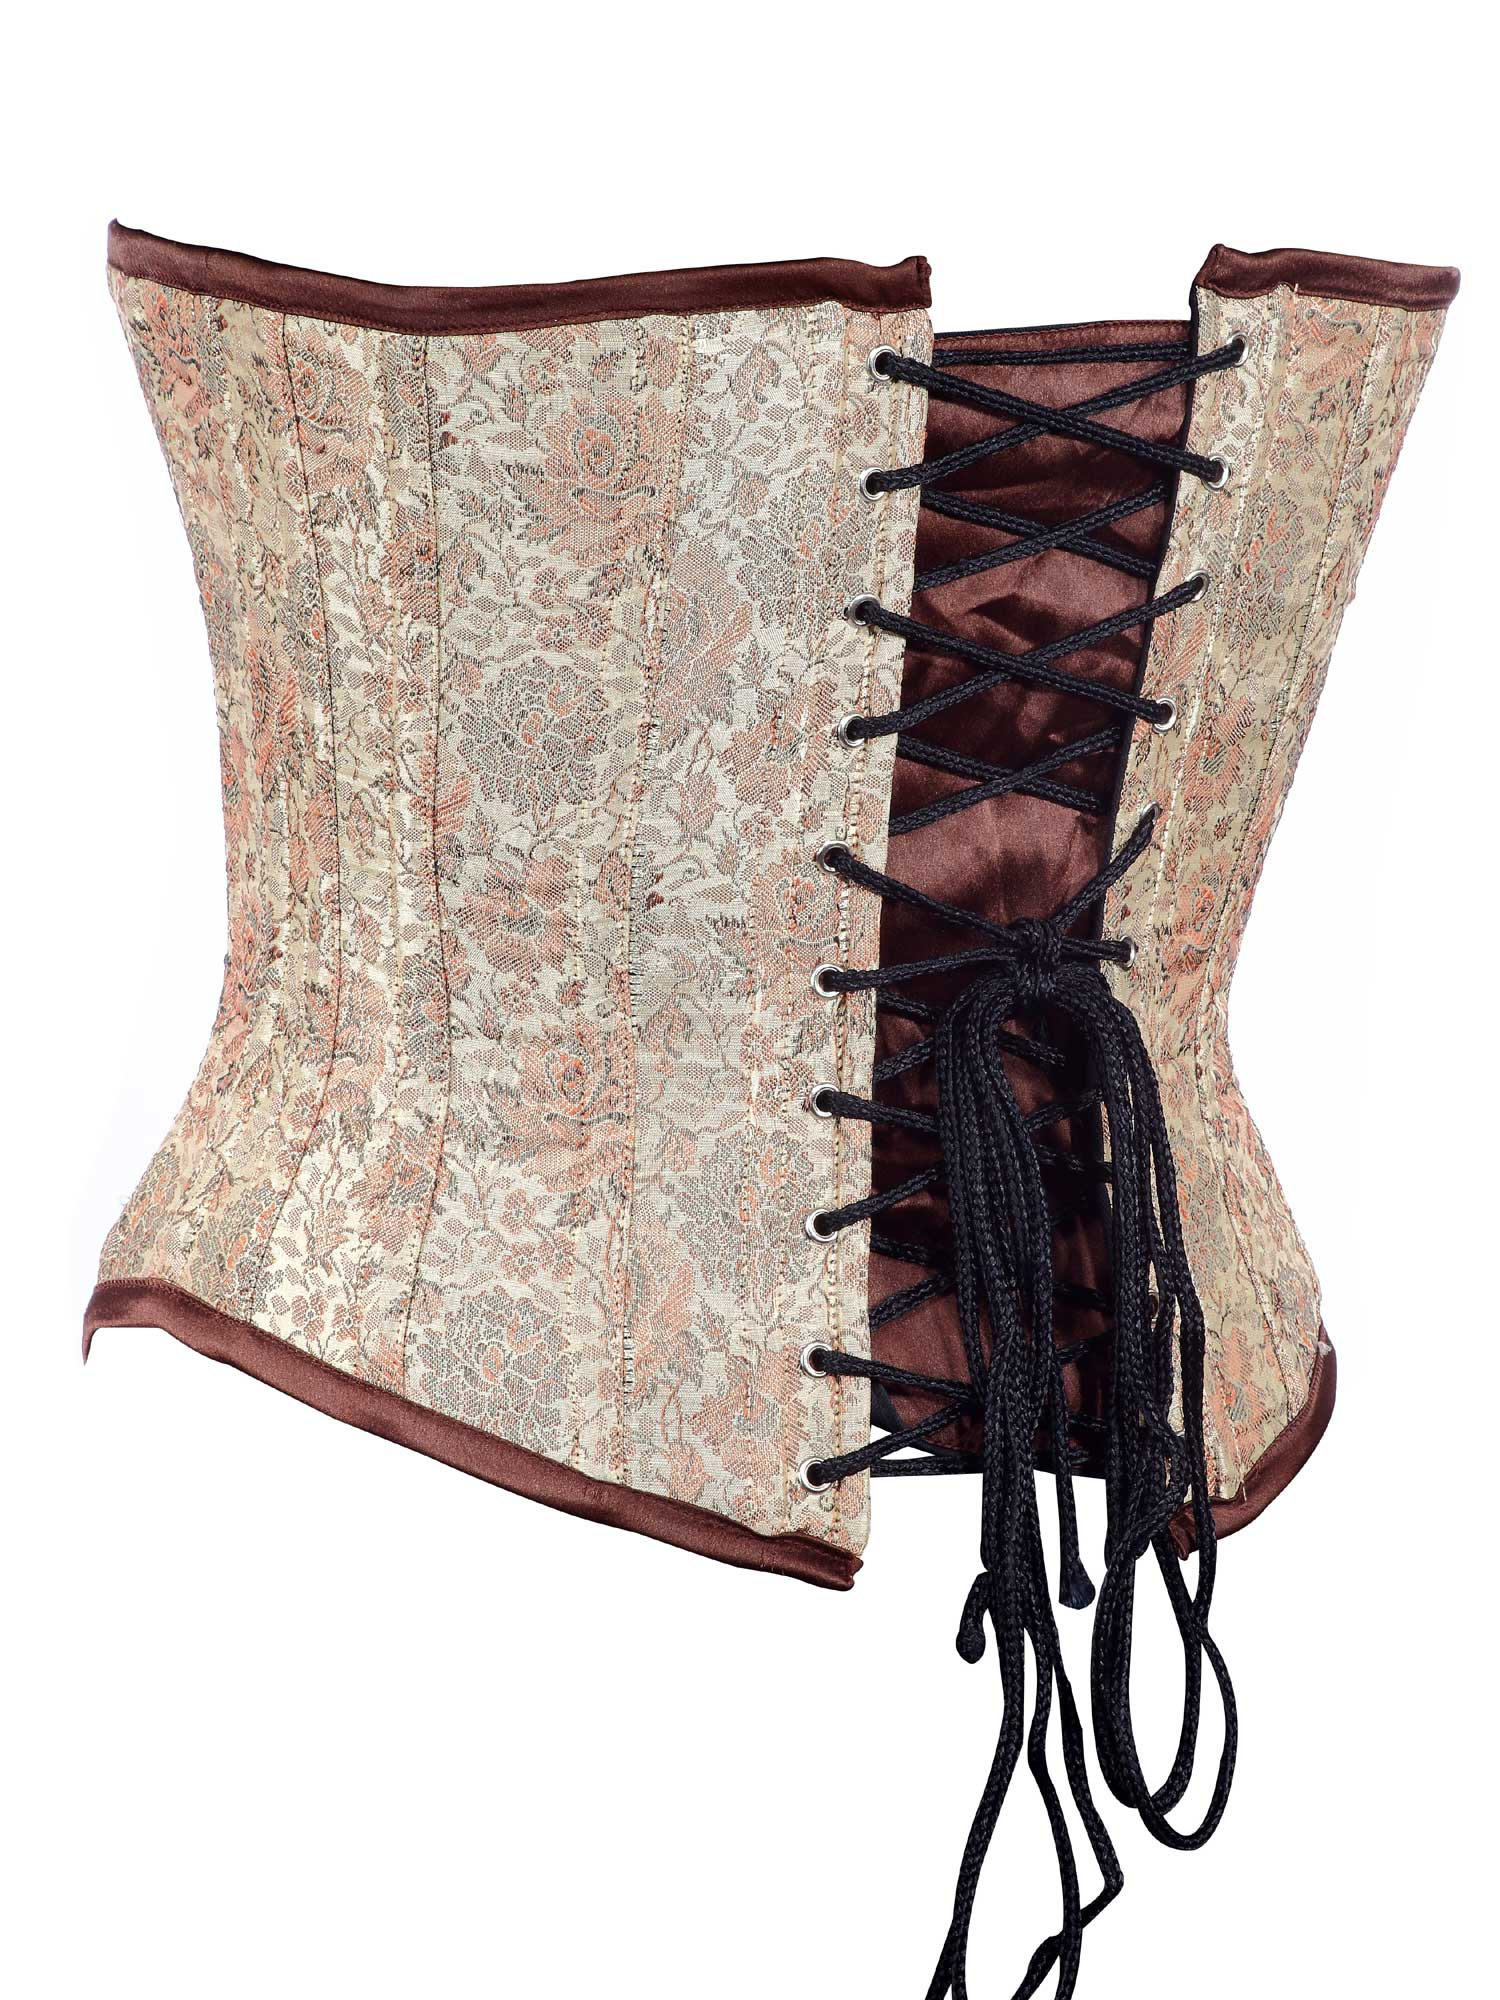 chocolate_suede_cream_brocade_fabric_steel_boning_underbust_corset_waist_cincher_bustier_bustiers_and_corsets_3.jpg